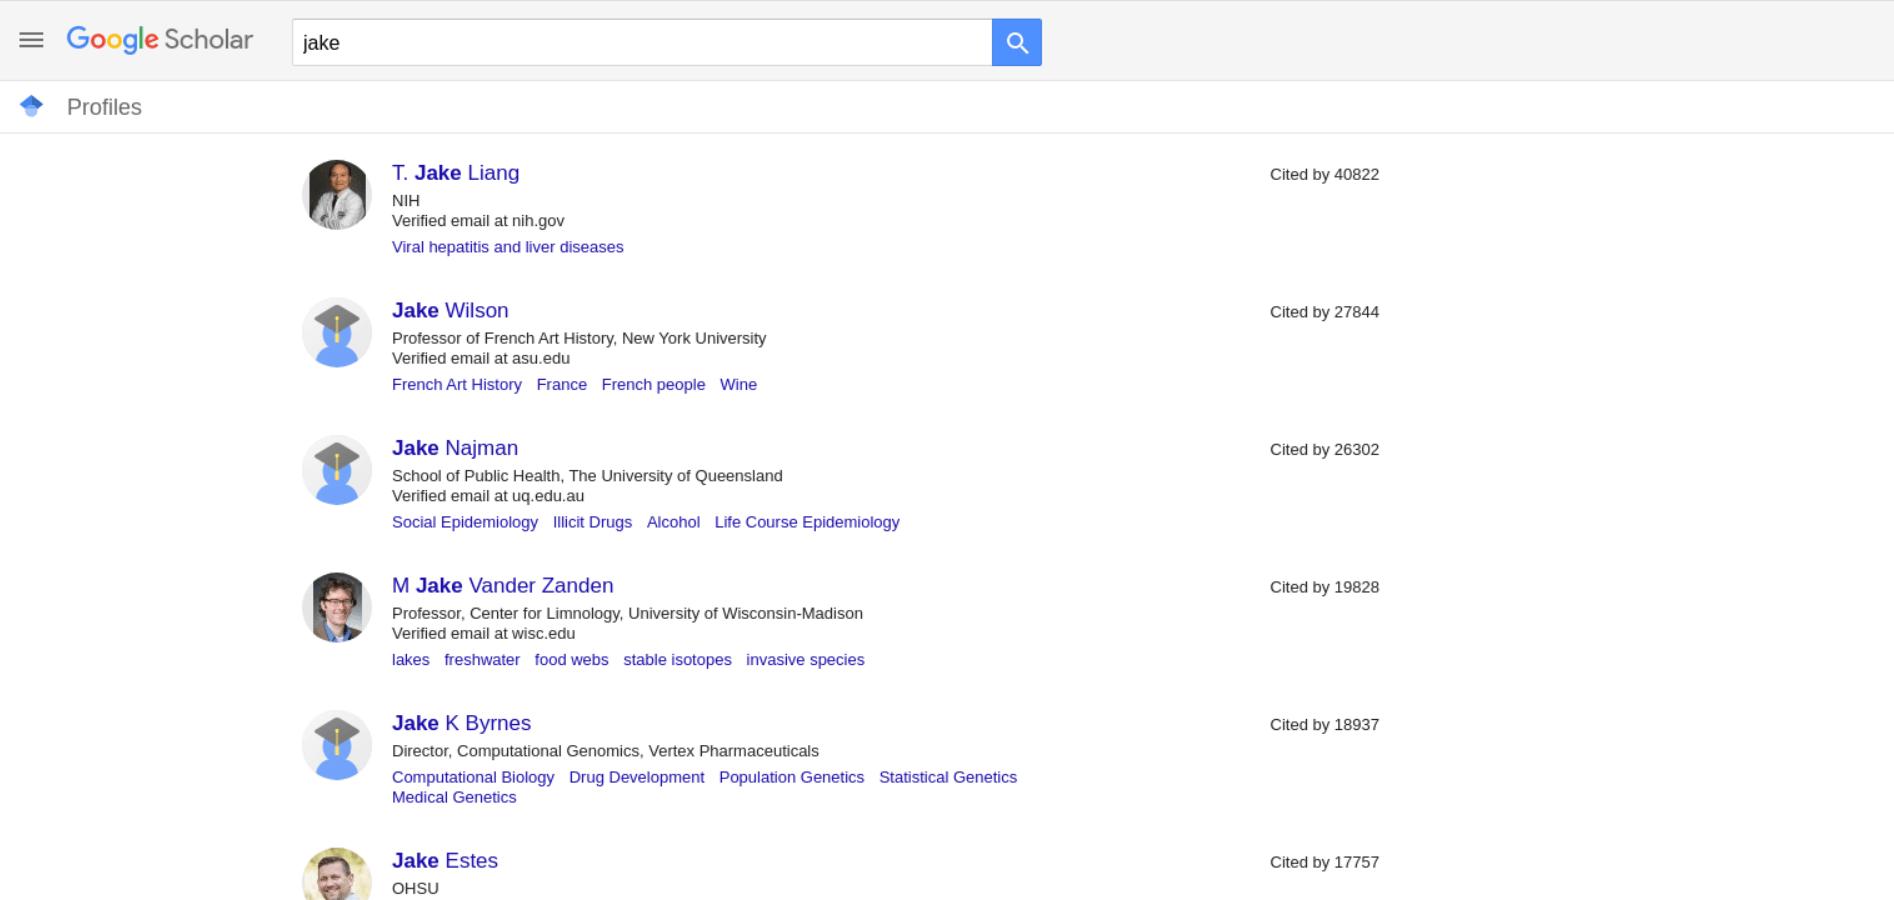 Google Scholar Profiles API example